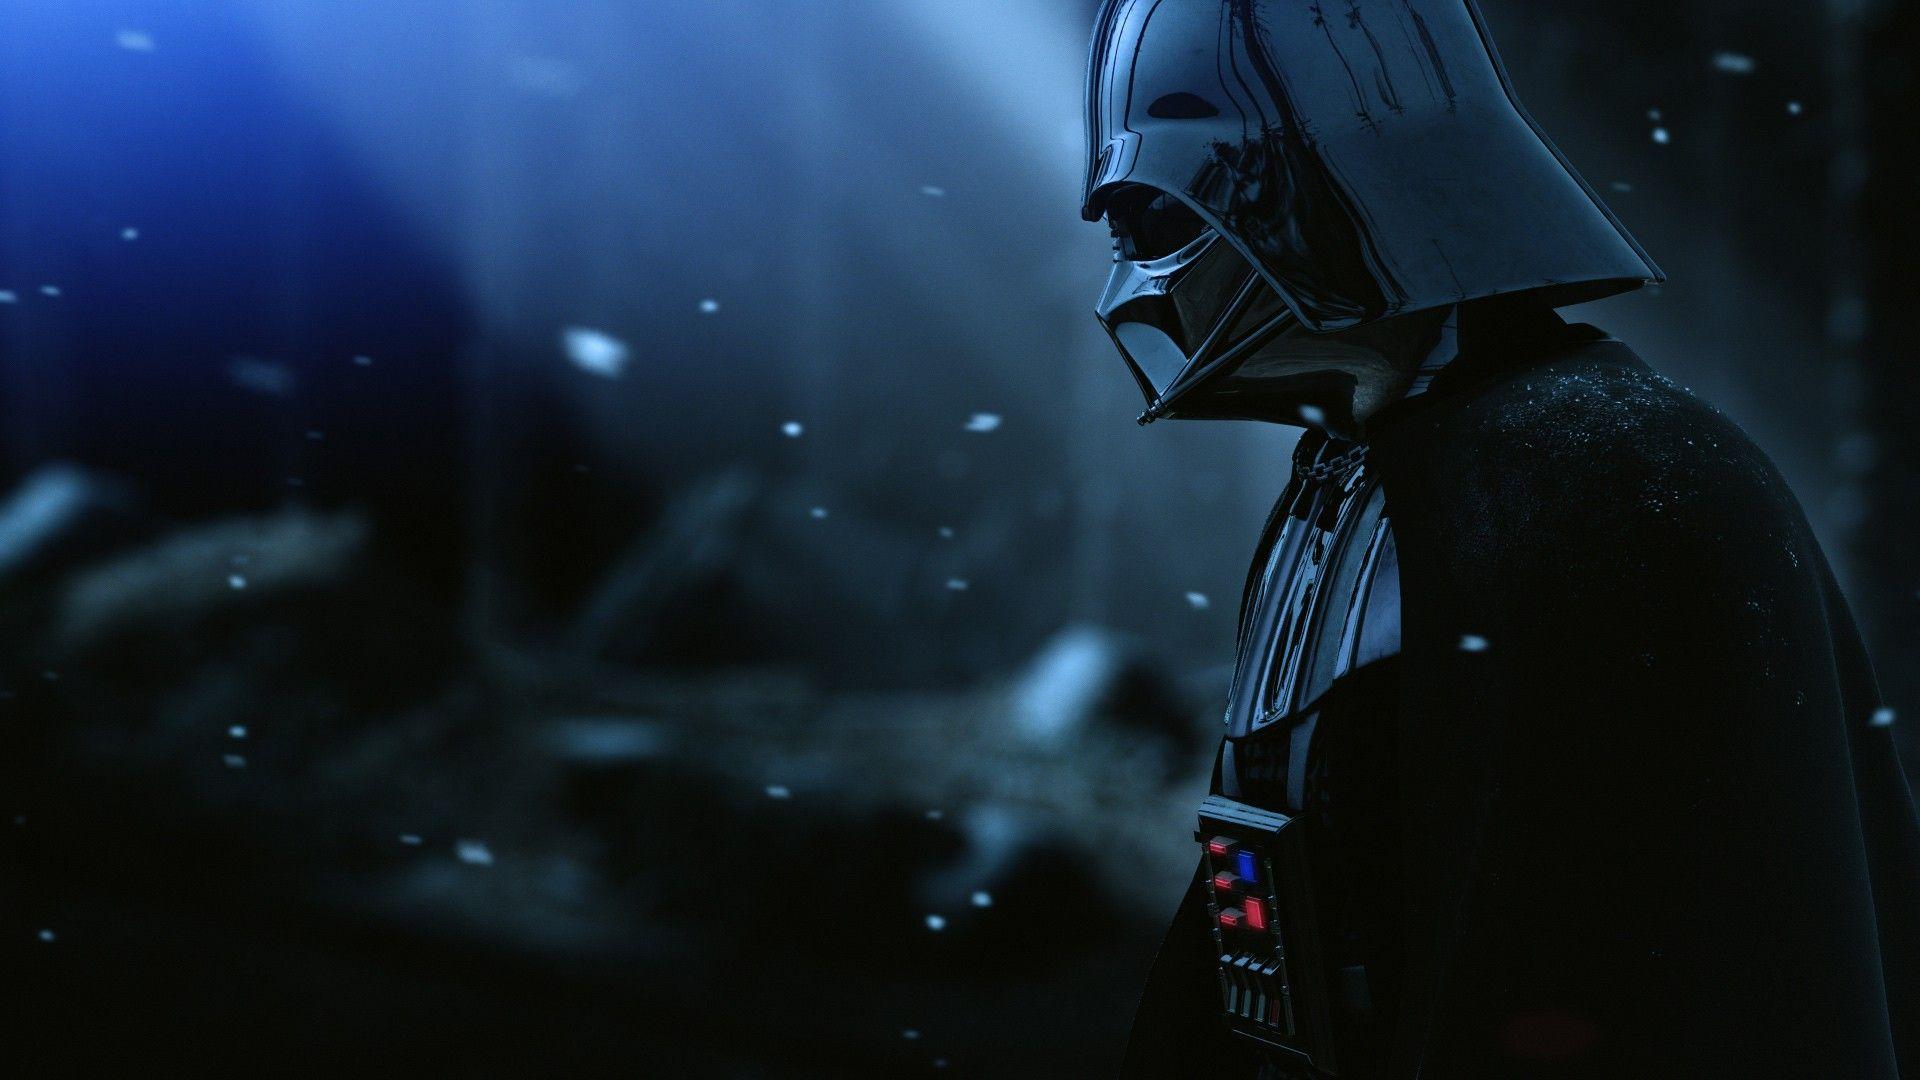 29 Dark Star Wars Space Background On Wallpapersafari